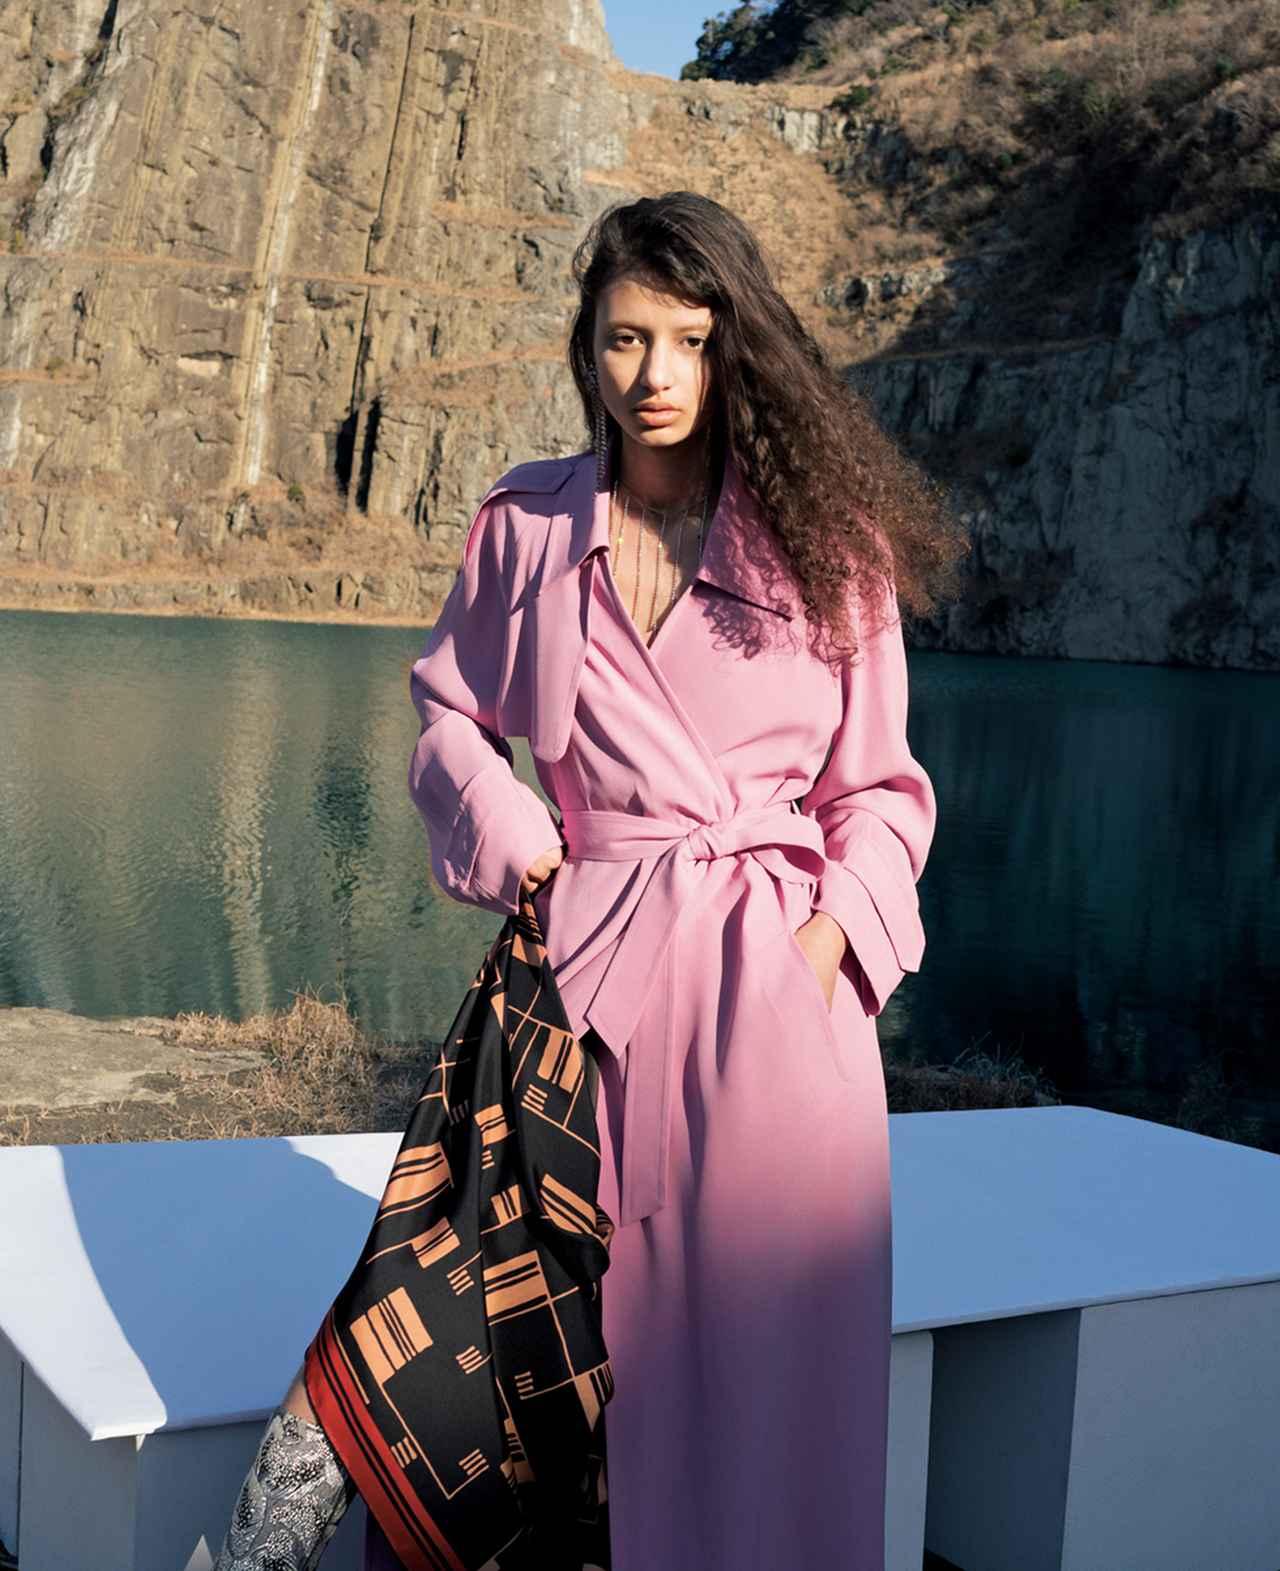 Images : 6番目の画像 - 「トレンチコートの多様性」のアルバム - T JAPAN:The New York Times Style Magazine 公式サイト